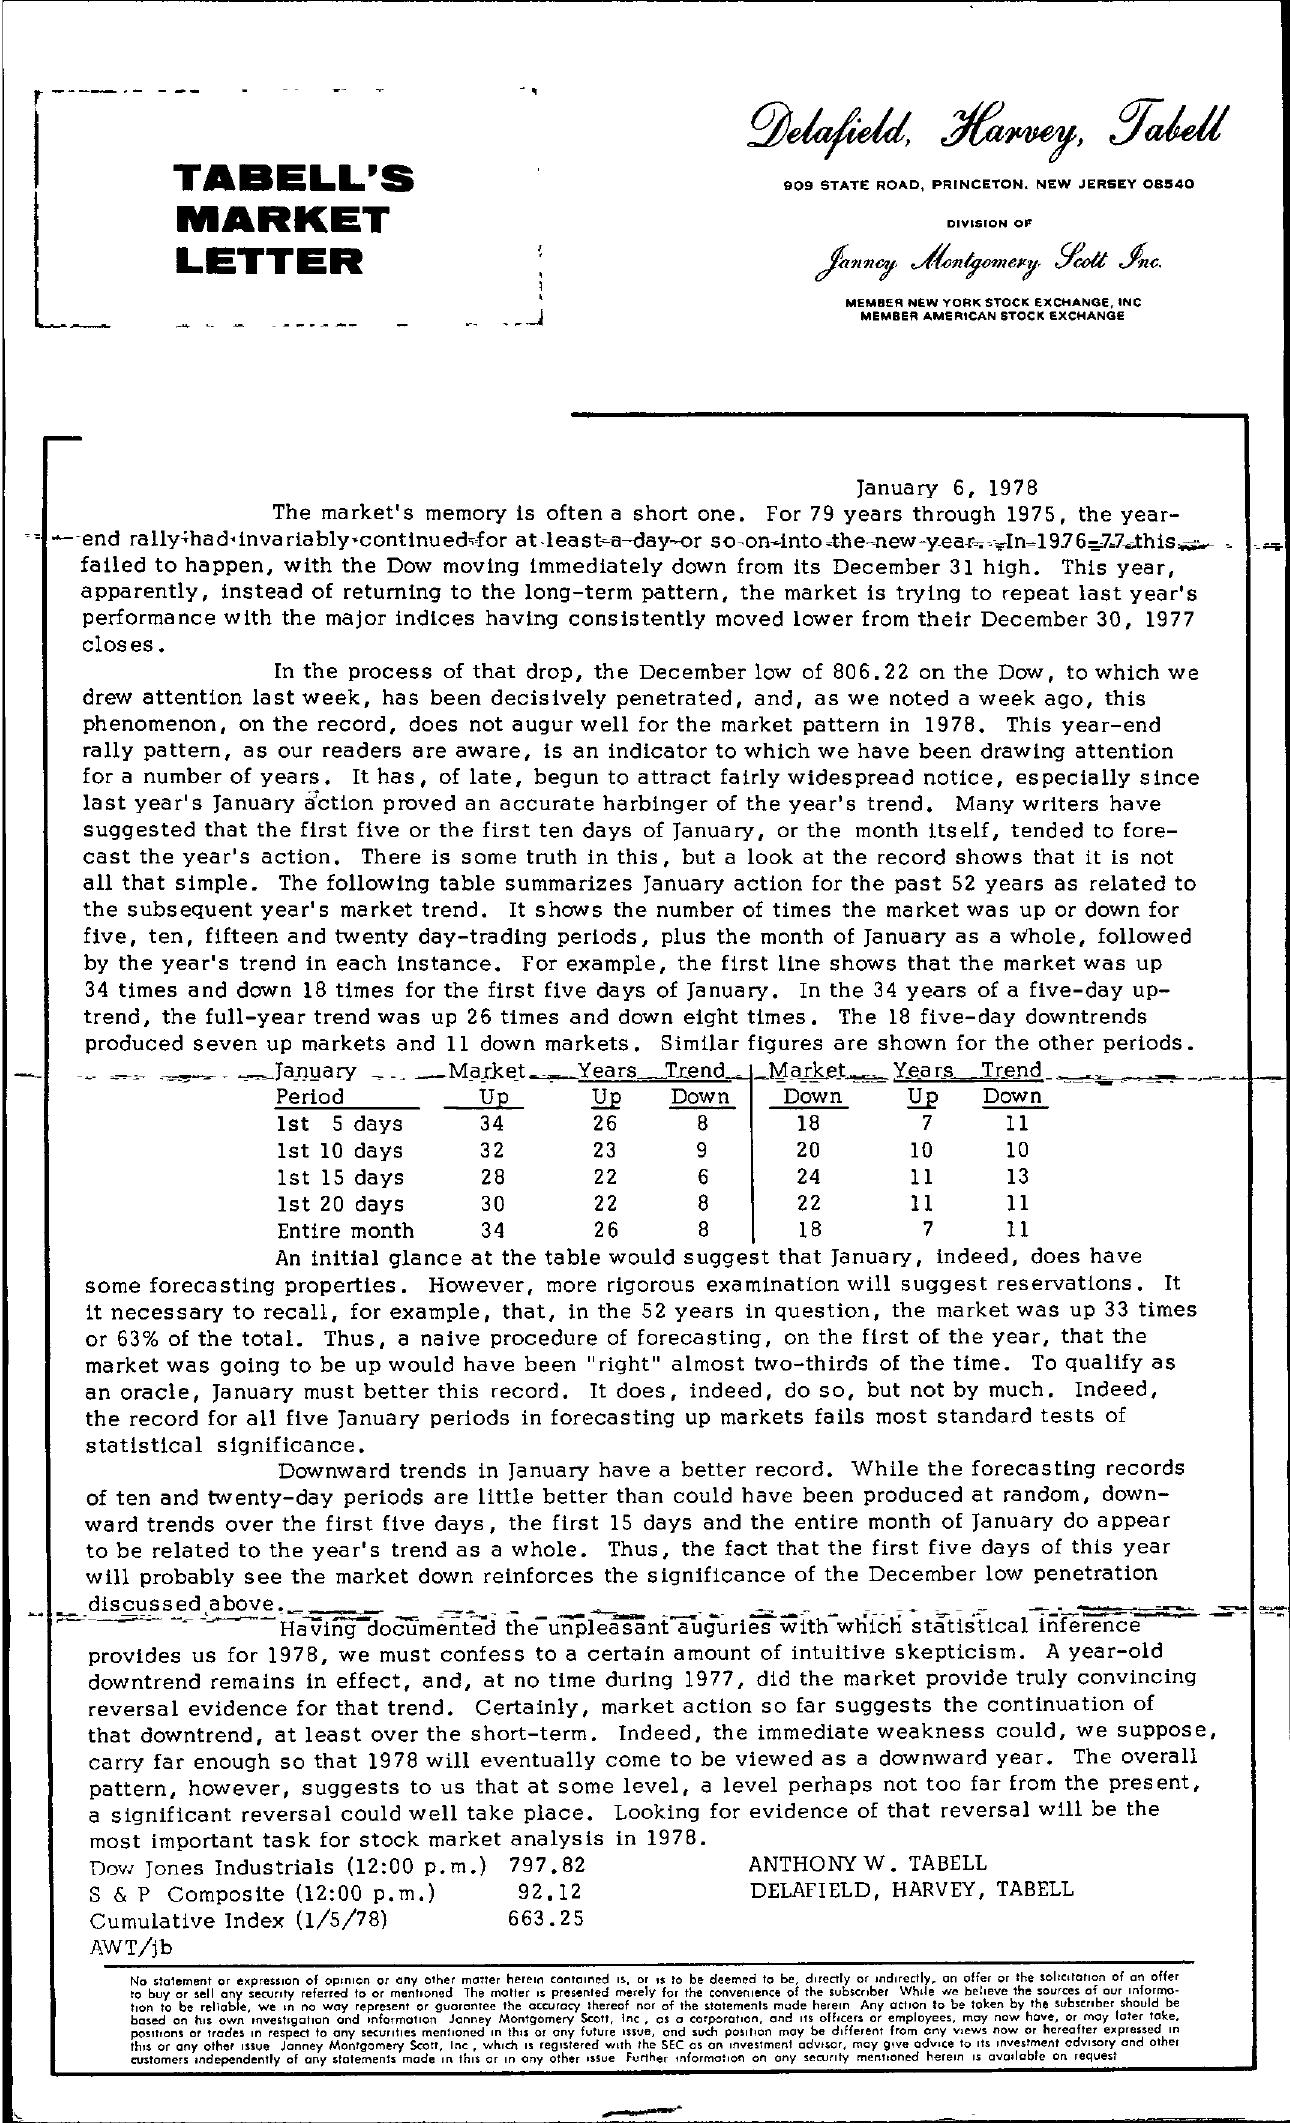 Tabell's Market Letter - January 06, 1978